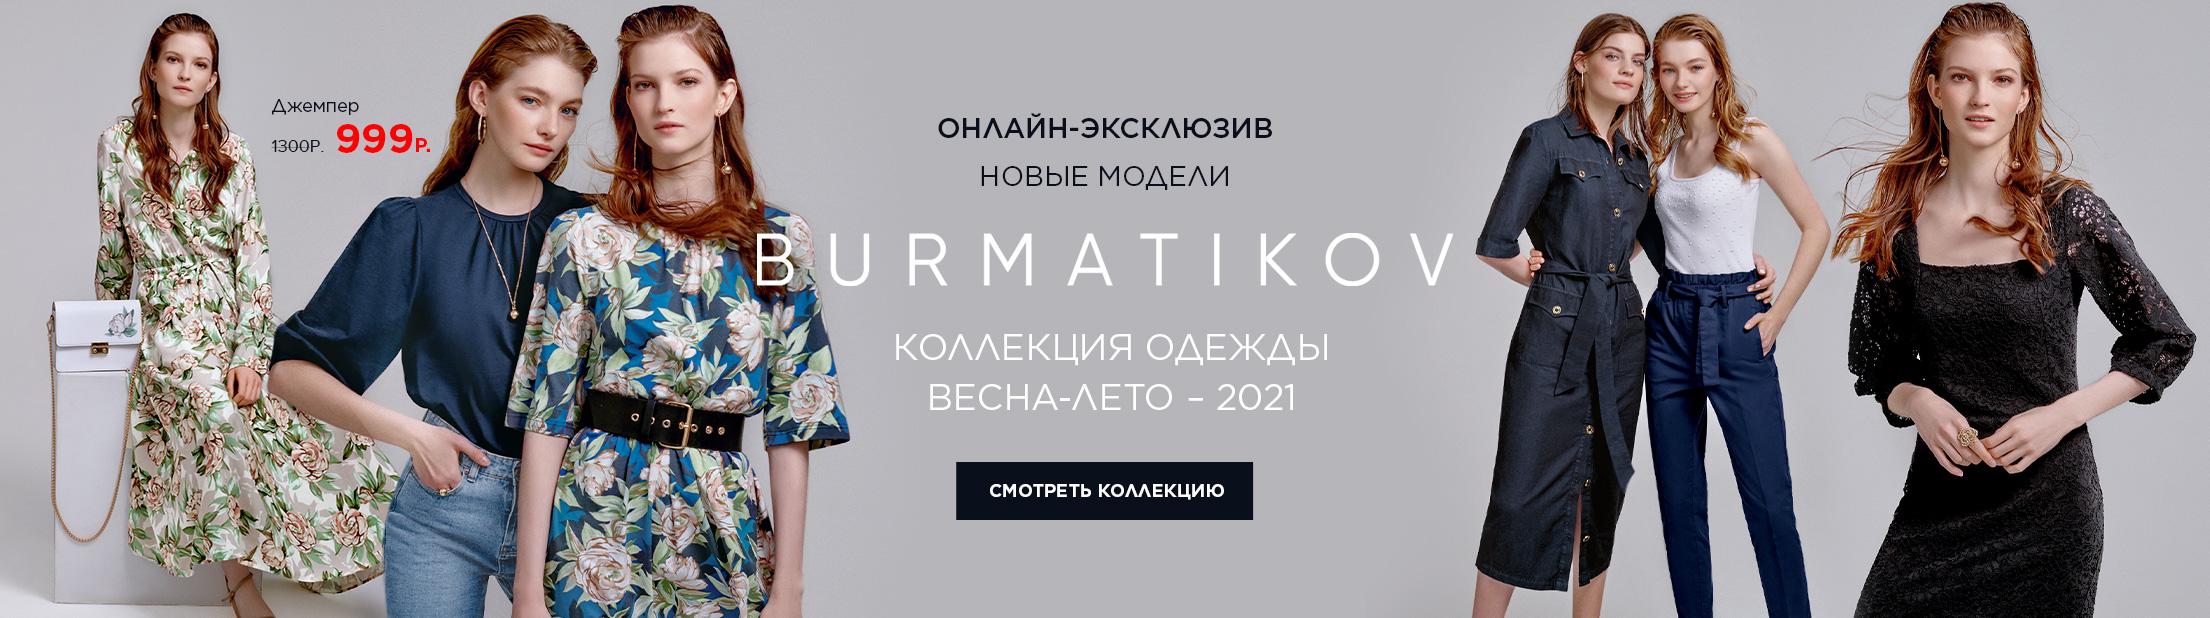 Фаберлик Бурматиков